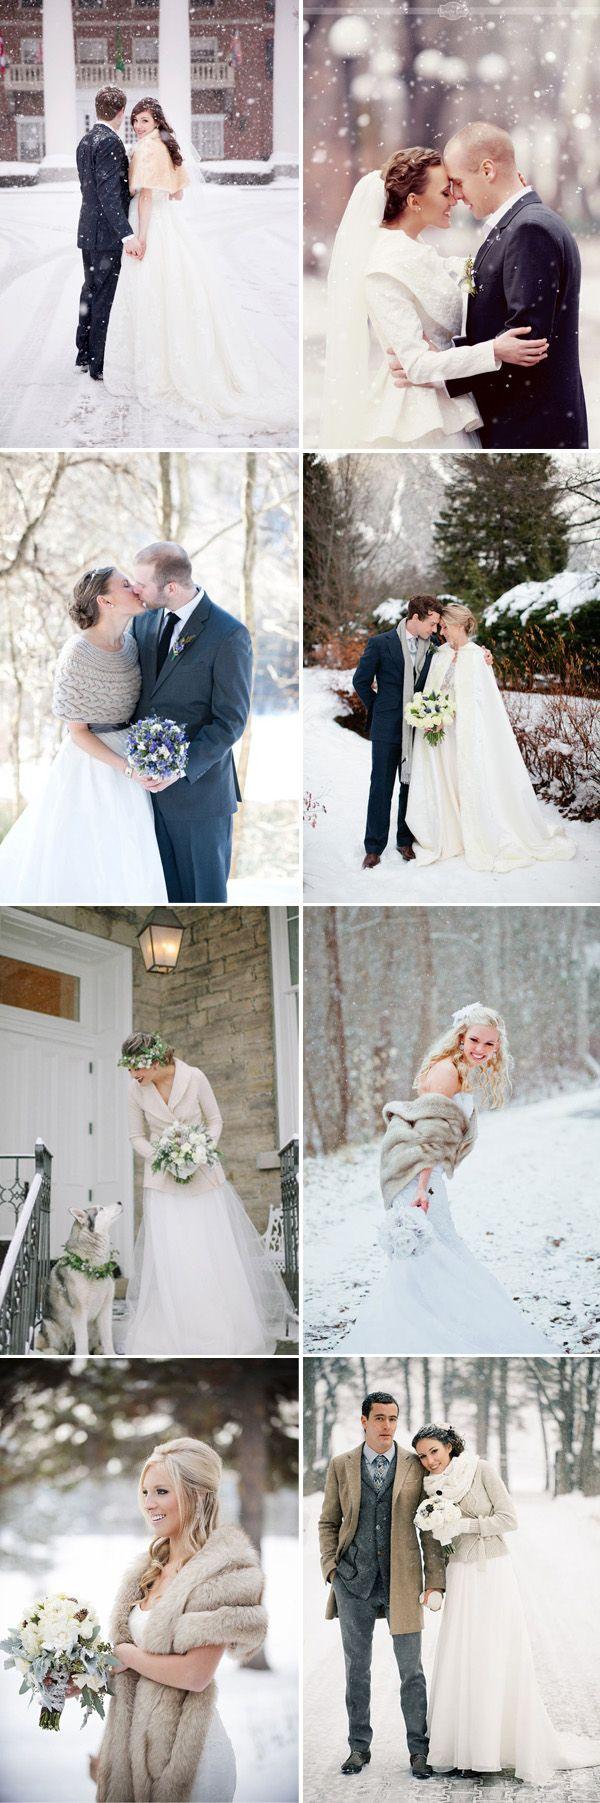 winter wonderland wedding south africa%0A    Wonderful Ideas For A Cozy and Fancy Winter Wedding